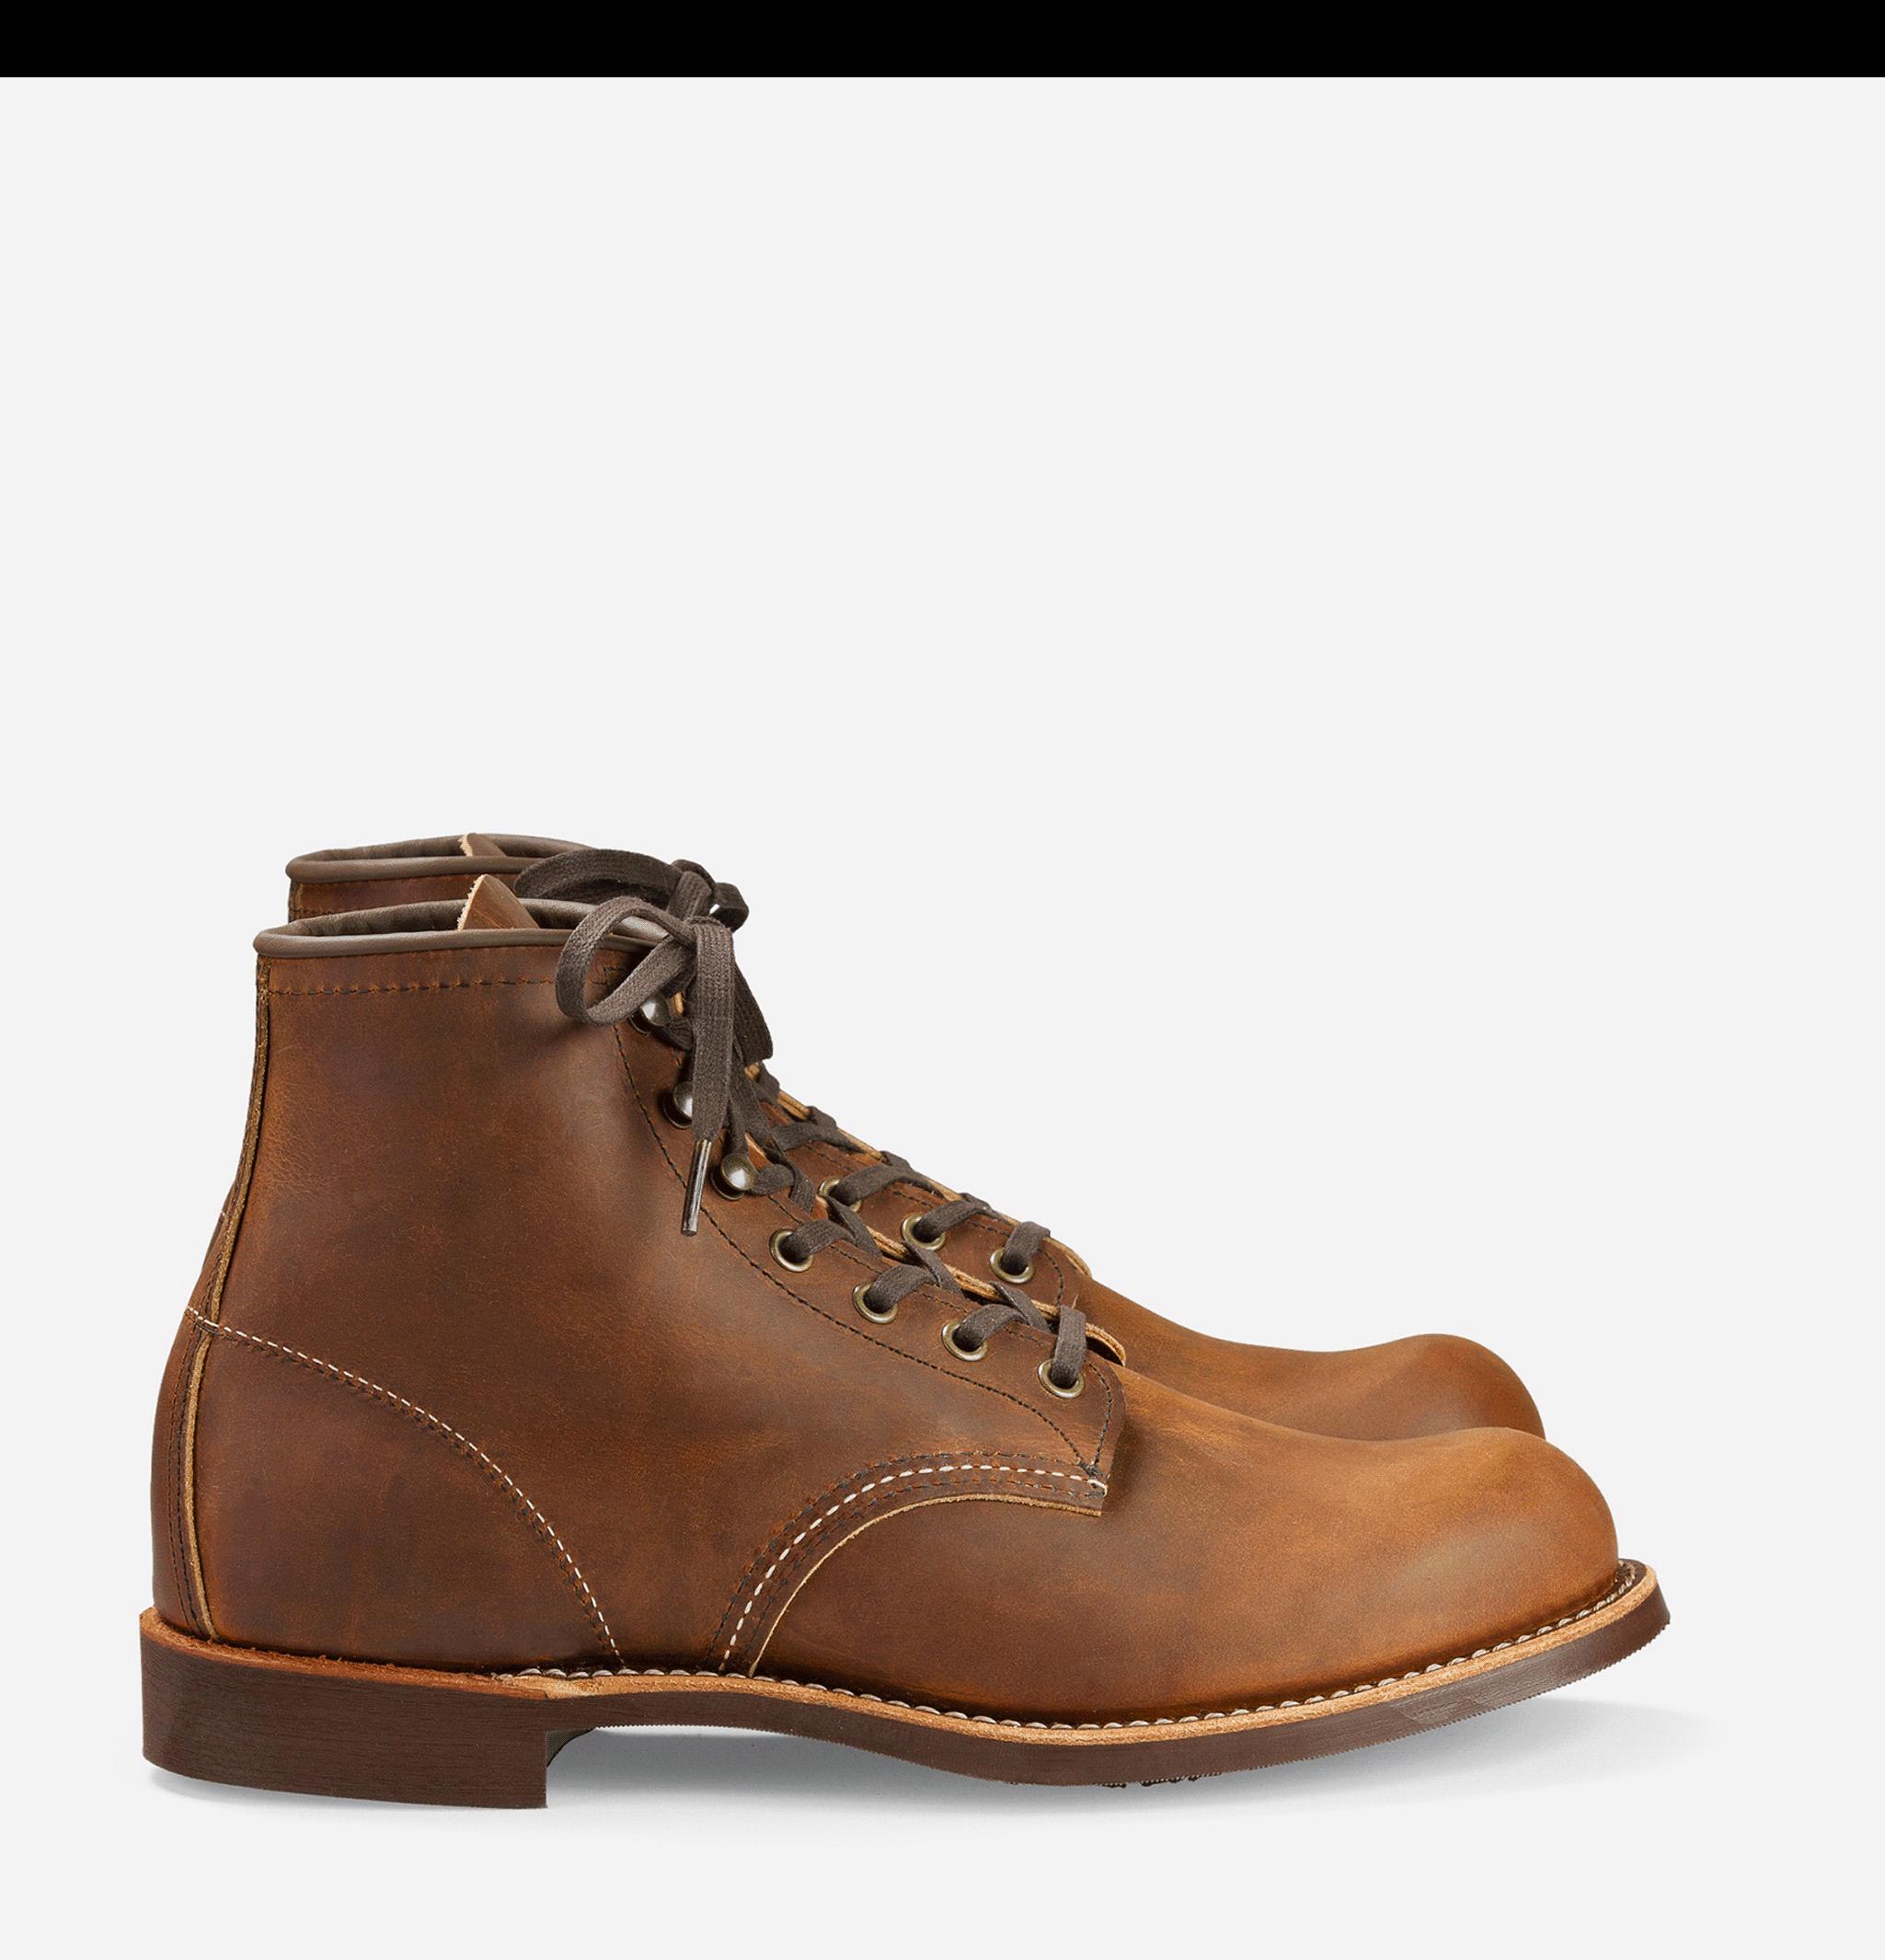 3343 - Blacksmith Copper